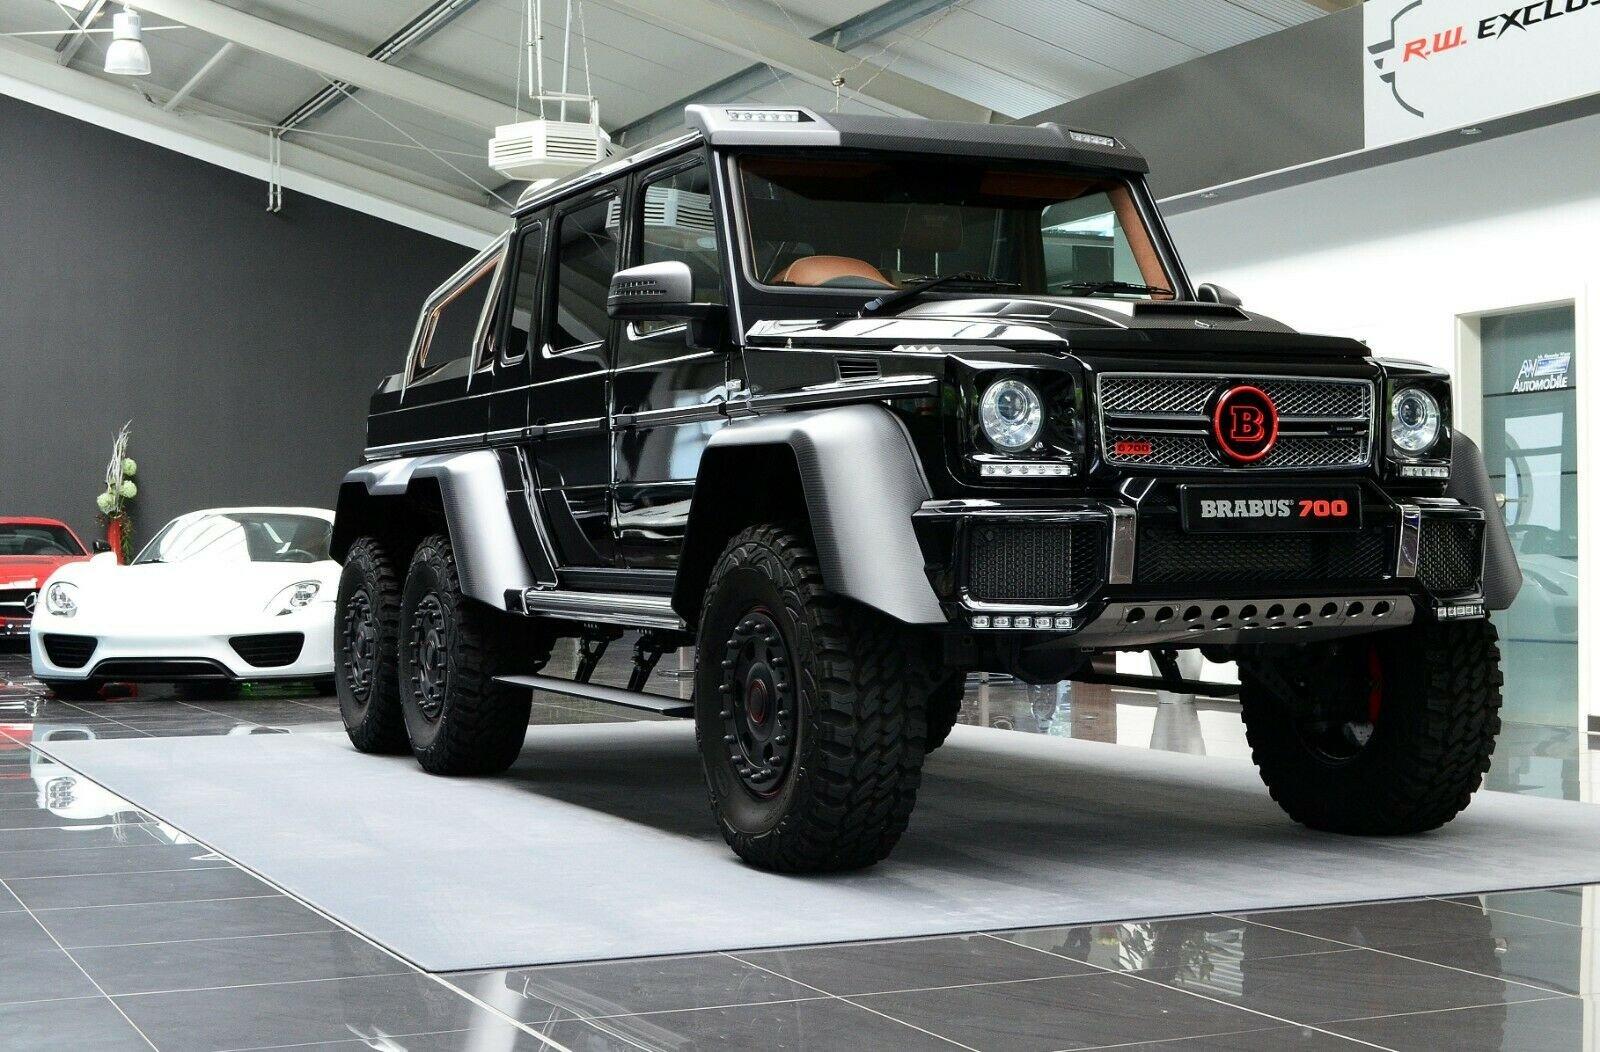 Mercedes-Benz G 63 AMG 6x6 Brabus700 - 1of15 (1)